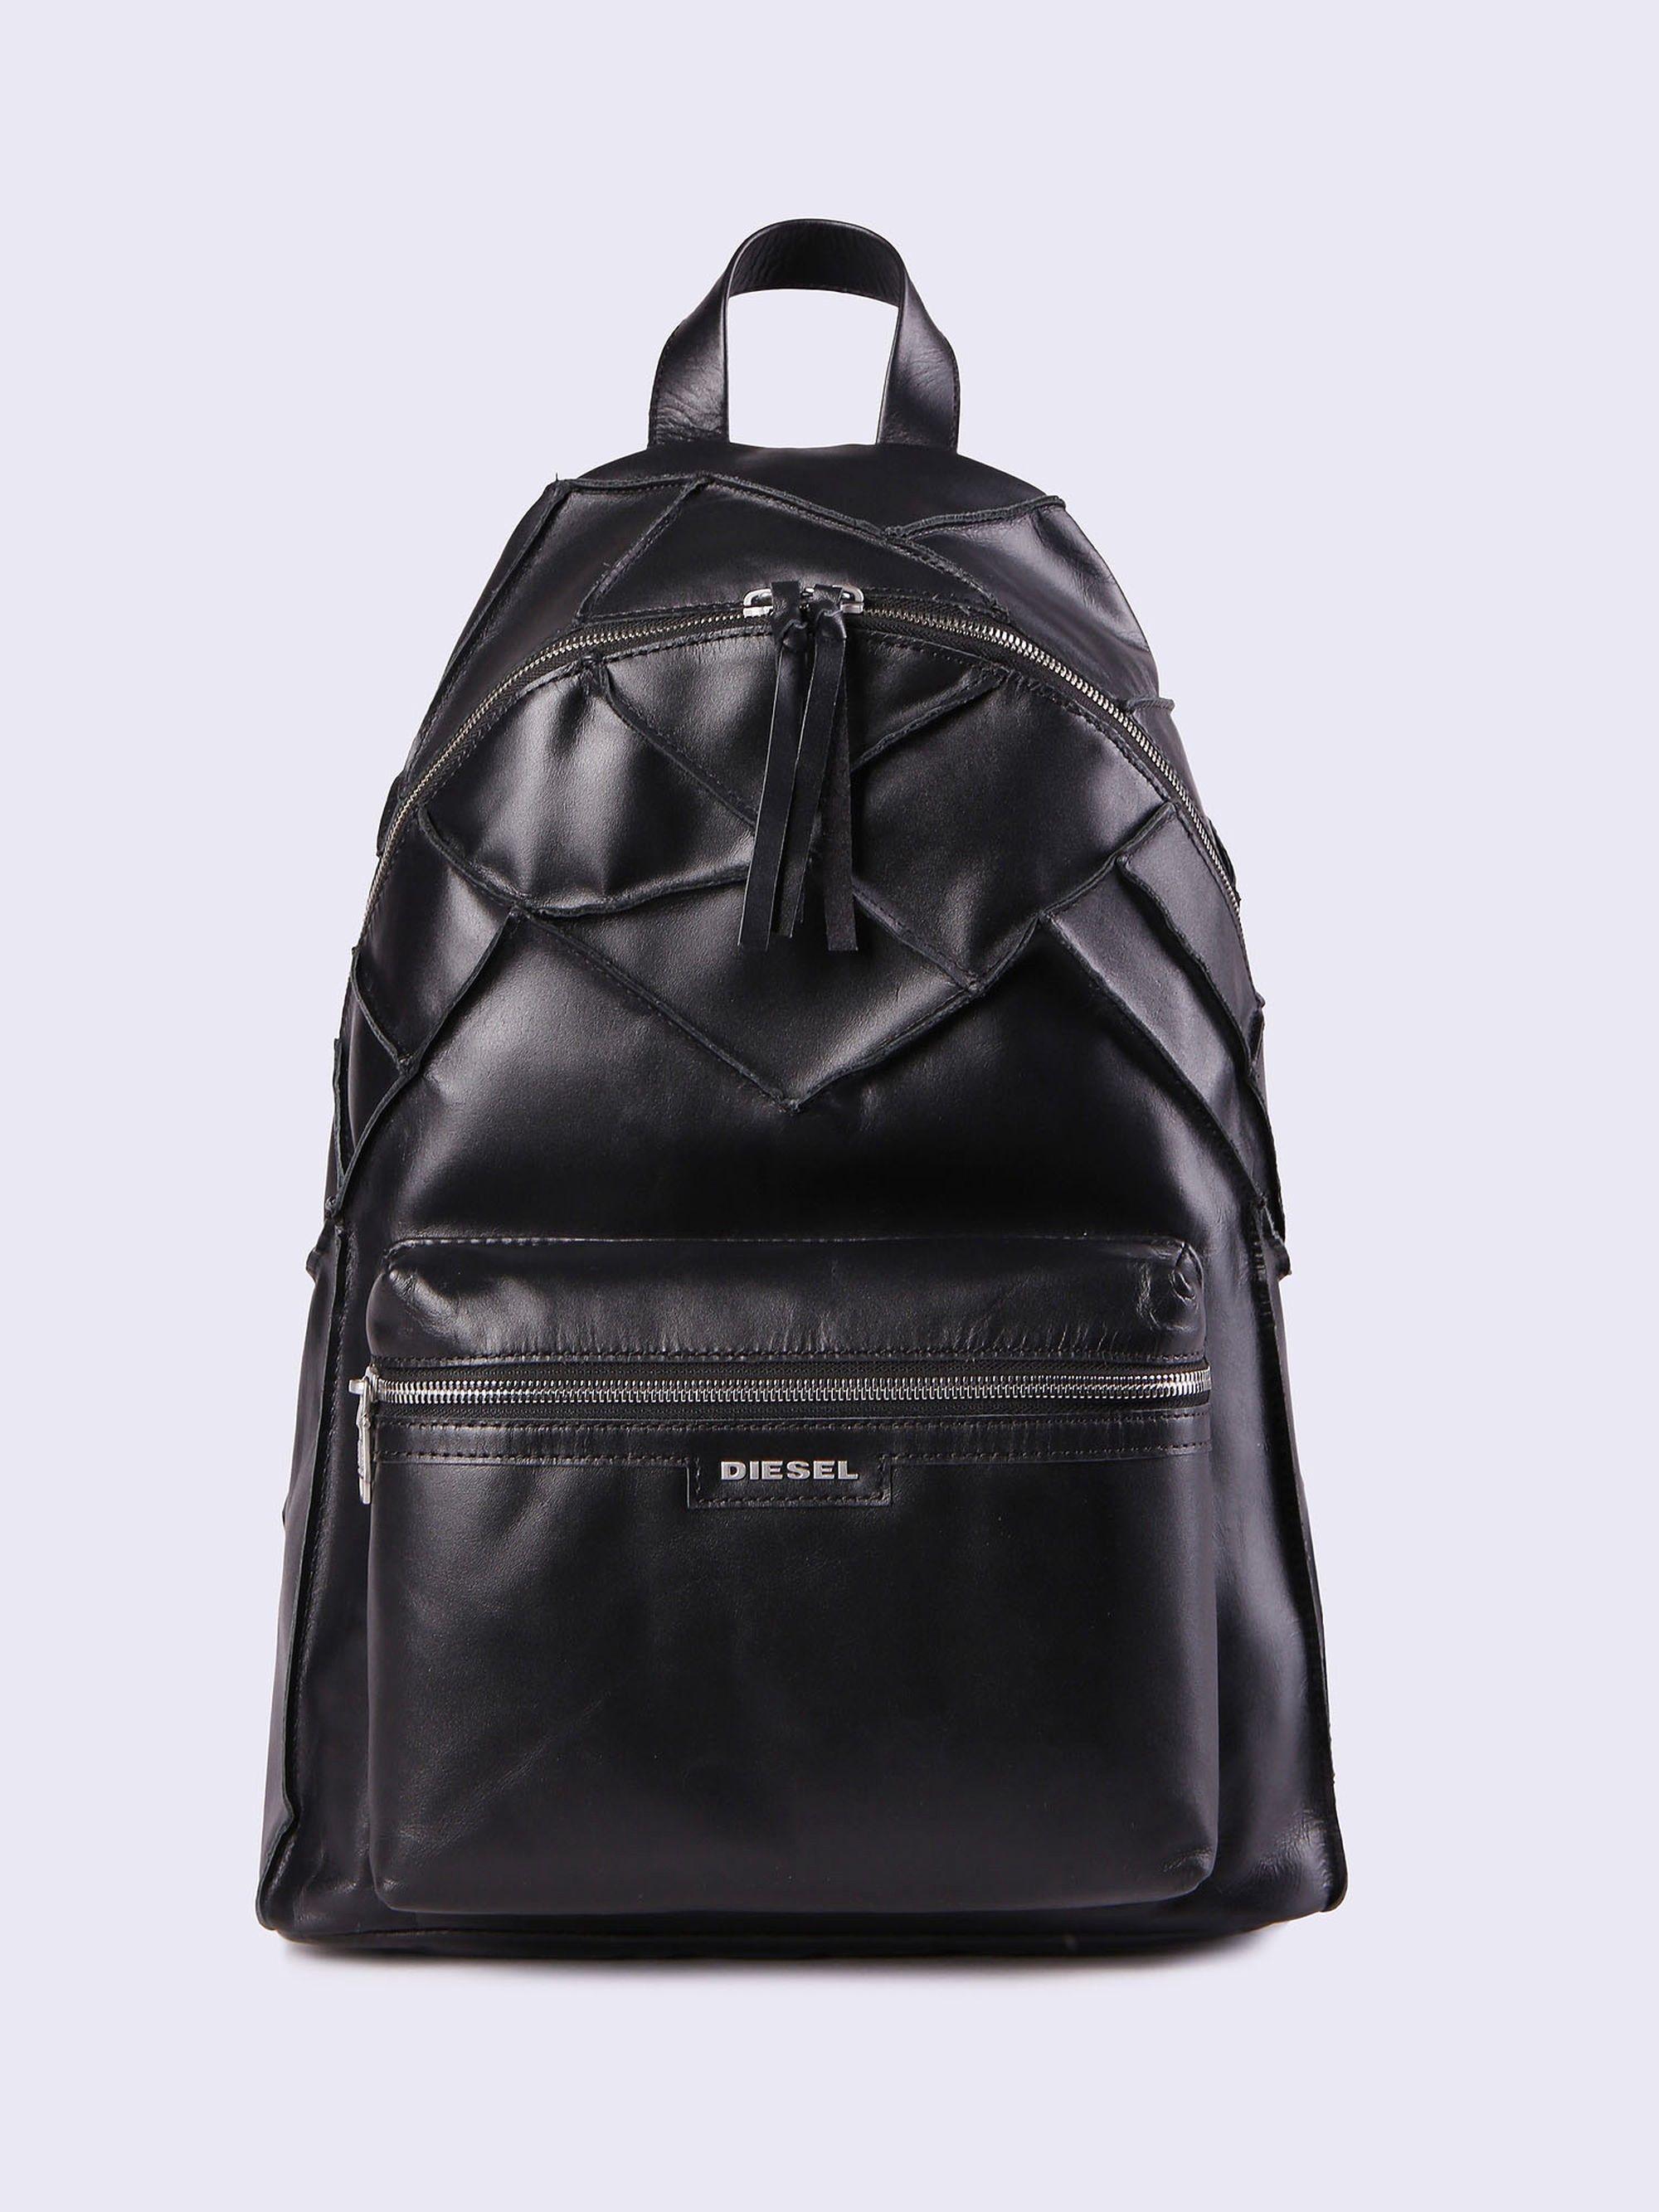 ad209941e8 DIESEL L-ROWLER BACK BACKPACKS. #diesel #bags #leather #backpacks #cotton #